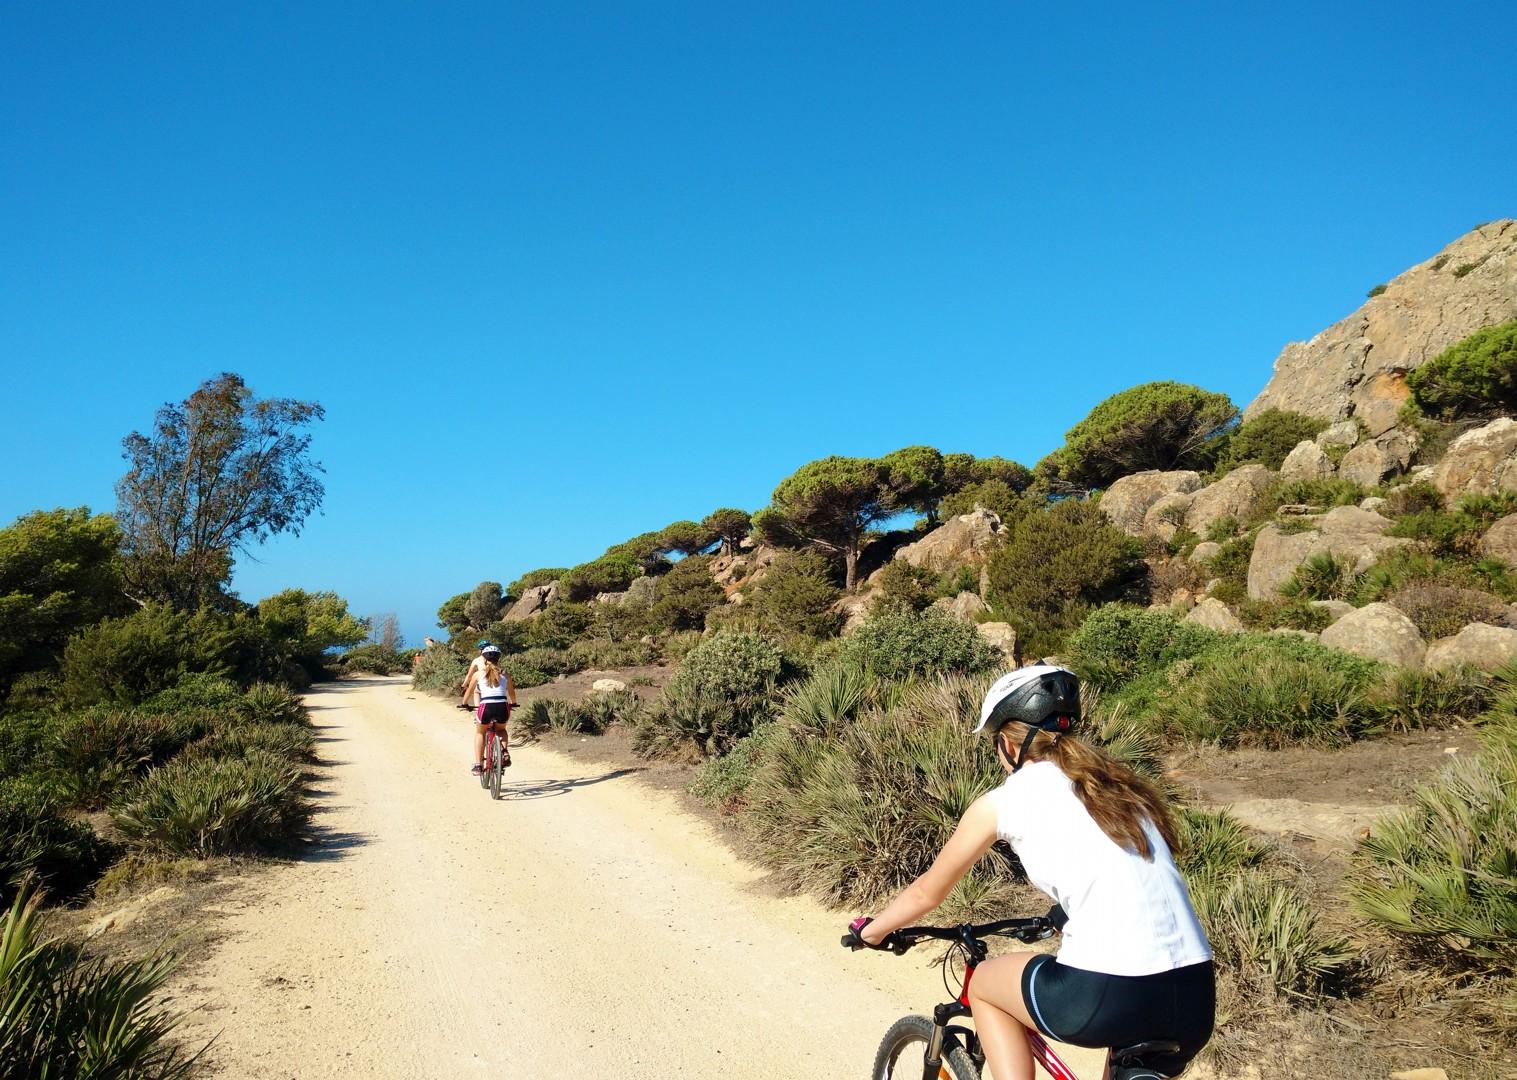 IMG_20171025_120148614.jpg - Southern Spain - Coastal Adventurer - Family Cycling